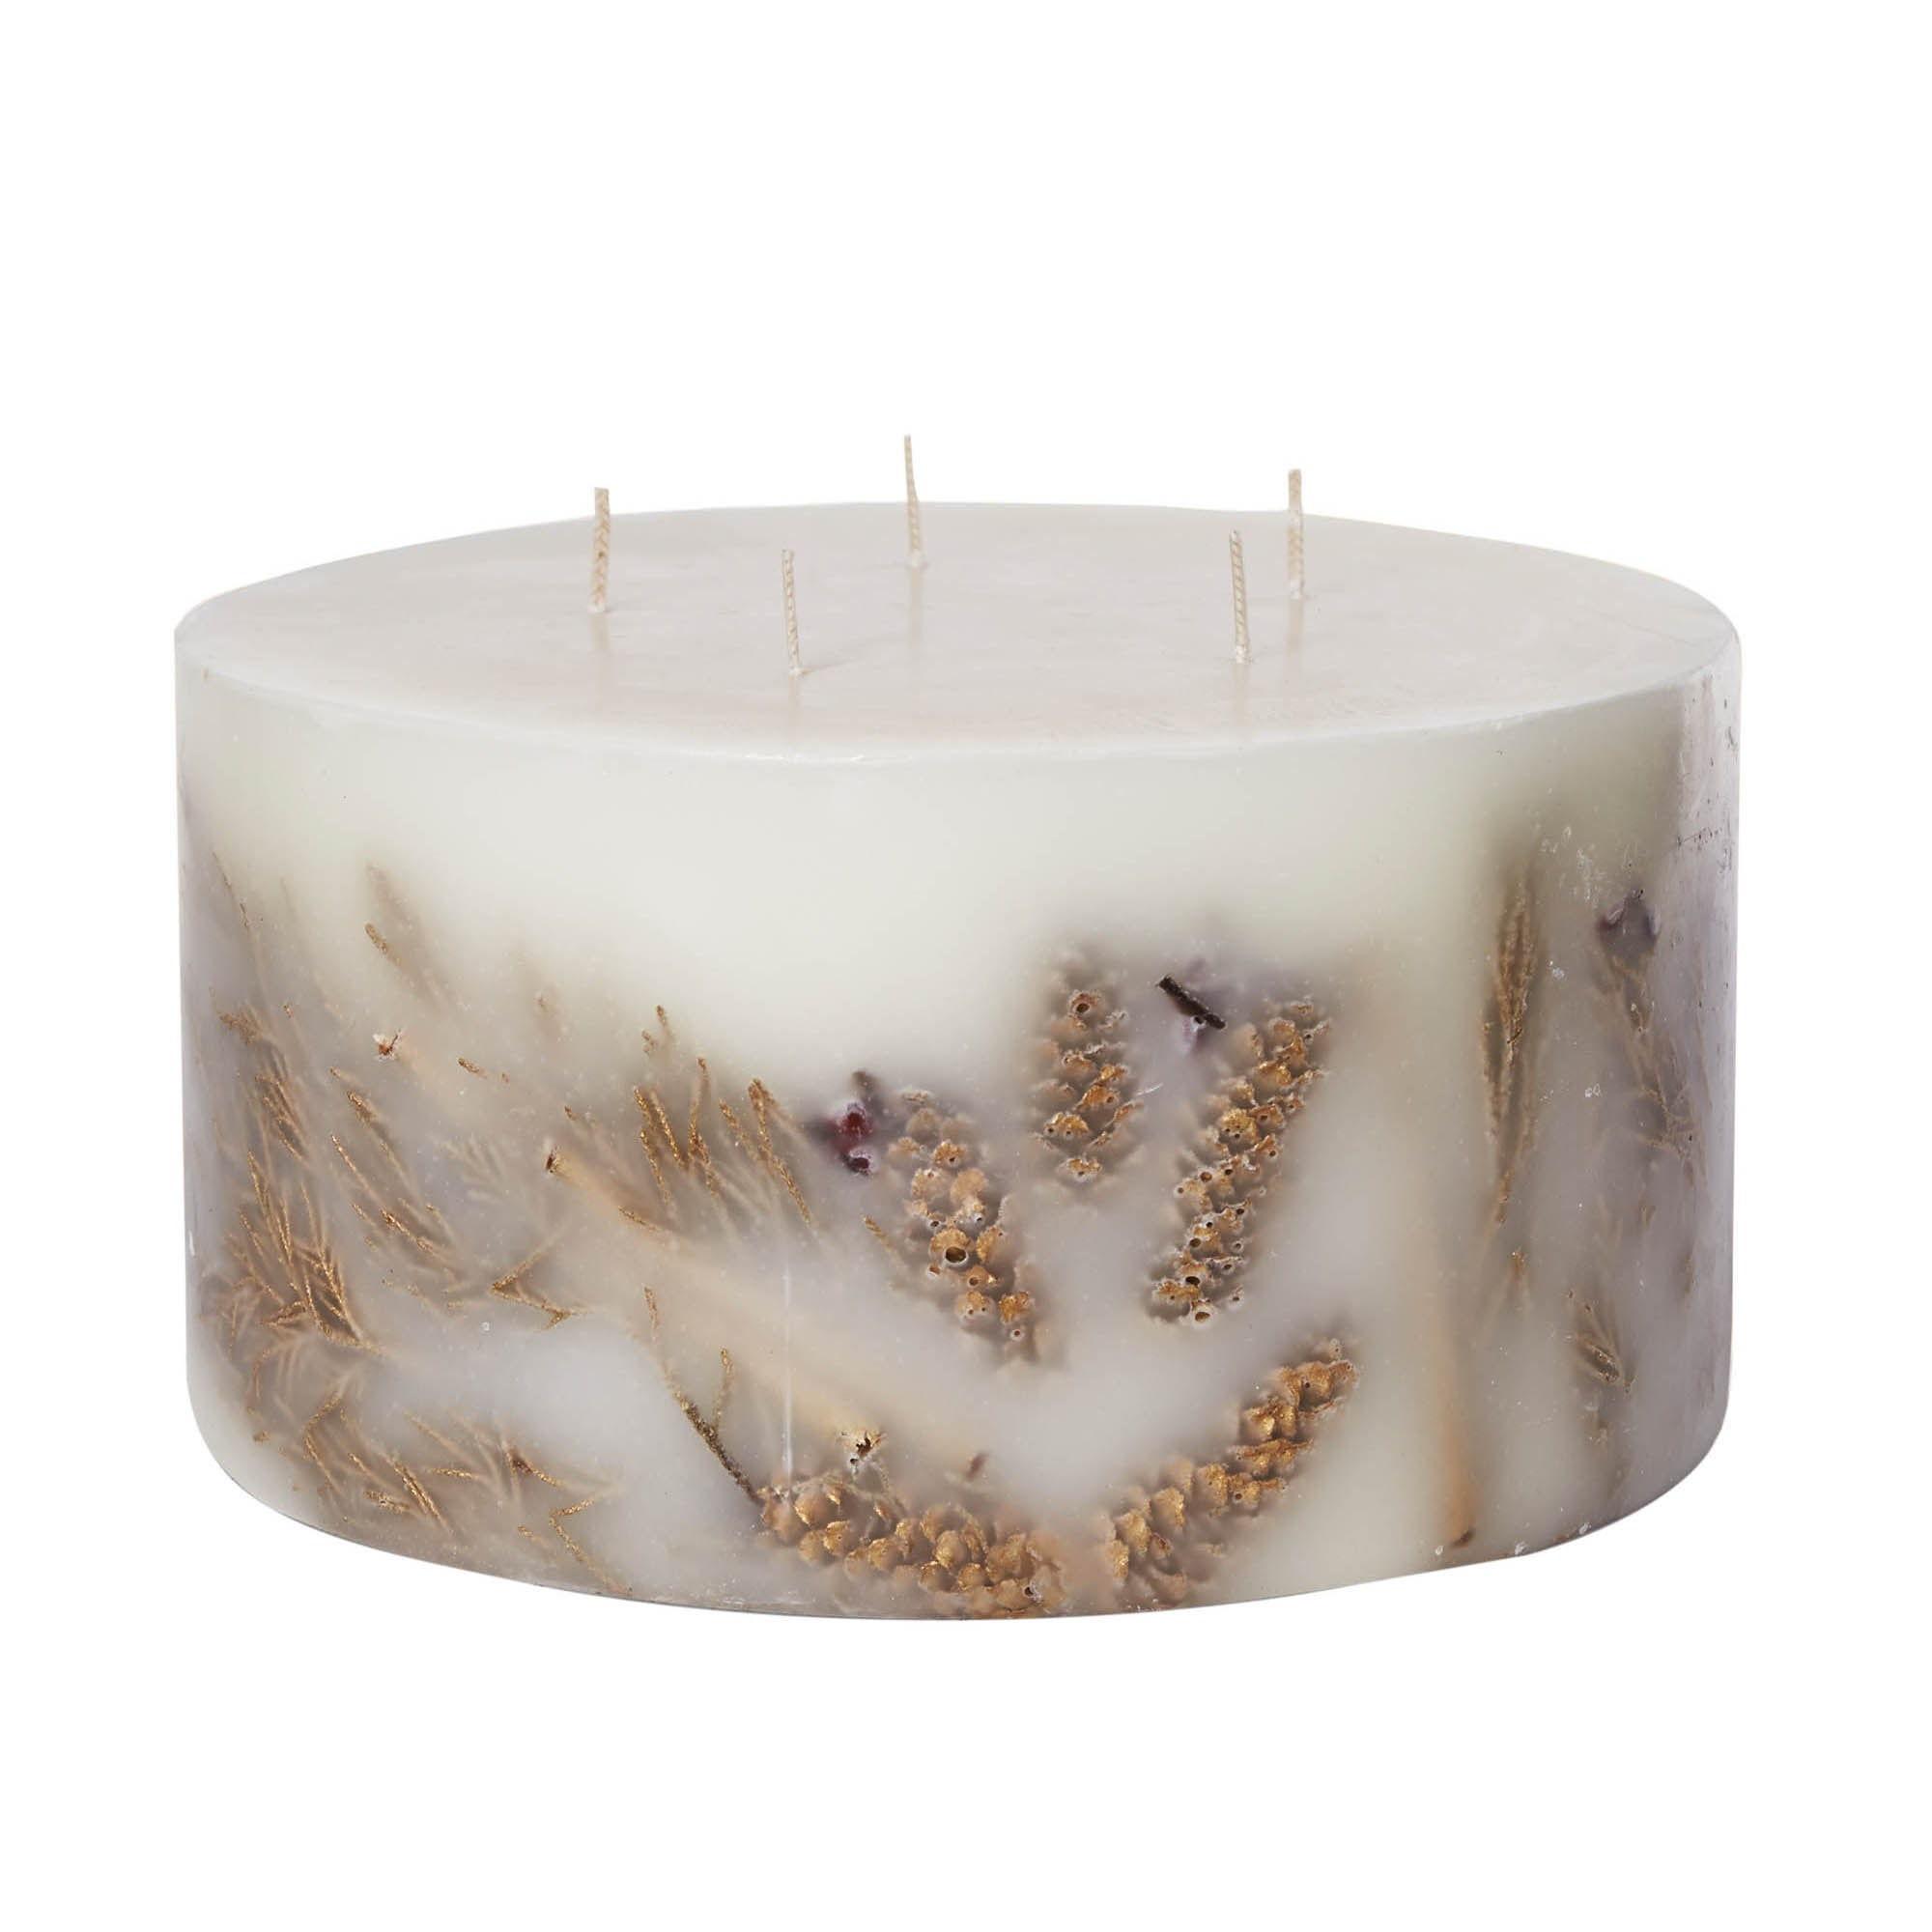 Photo of Large 5 wick frankincense & myrrh inclusion candle cream